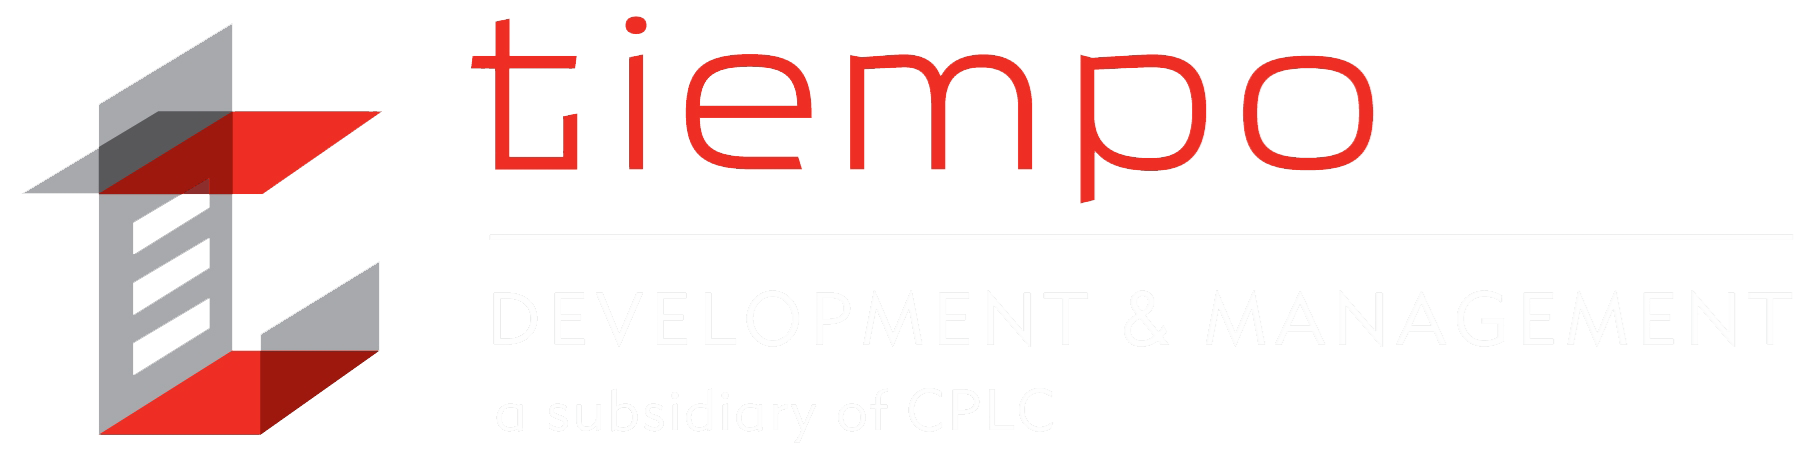 Phoenix Property Logo 25